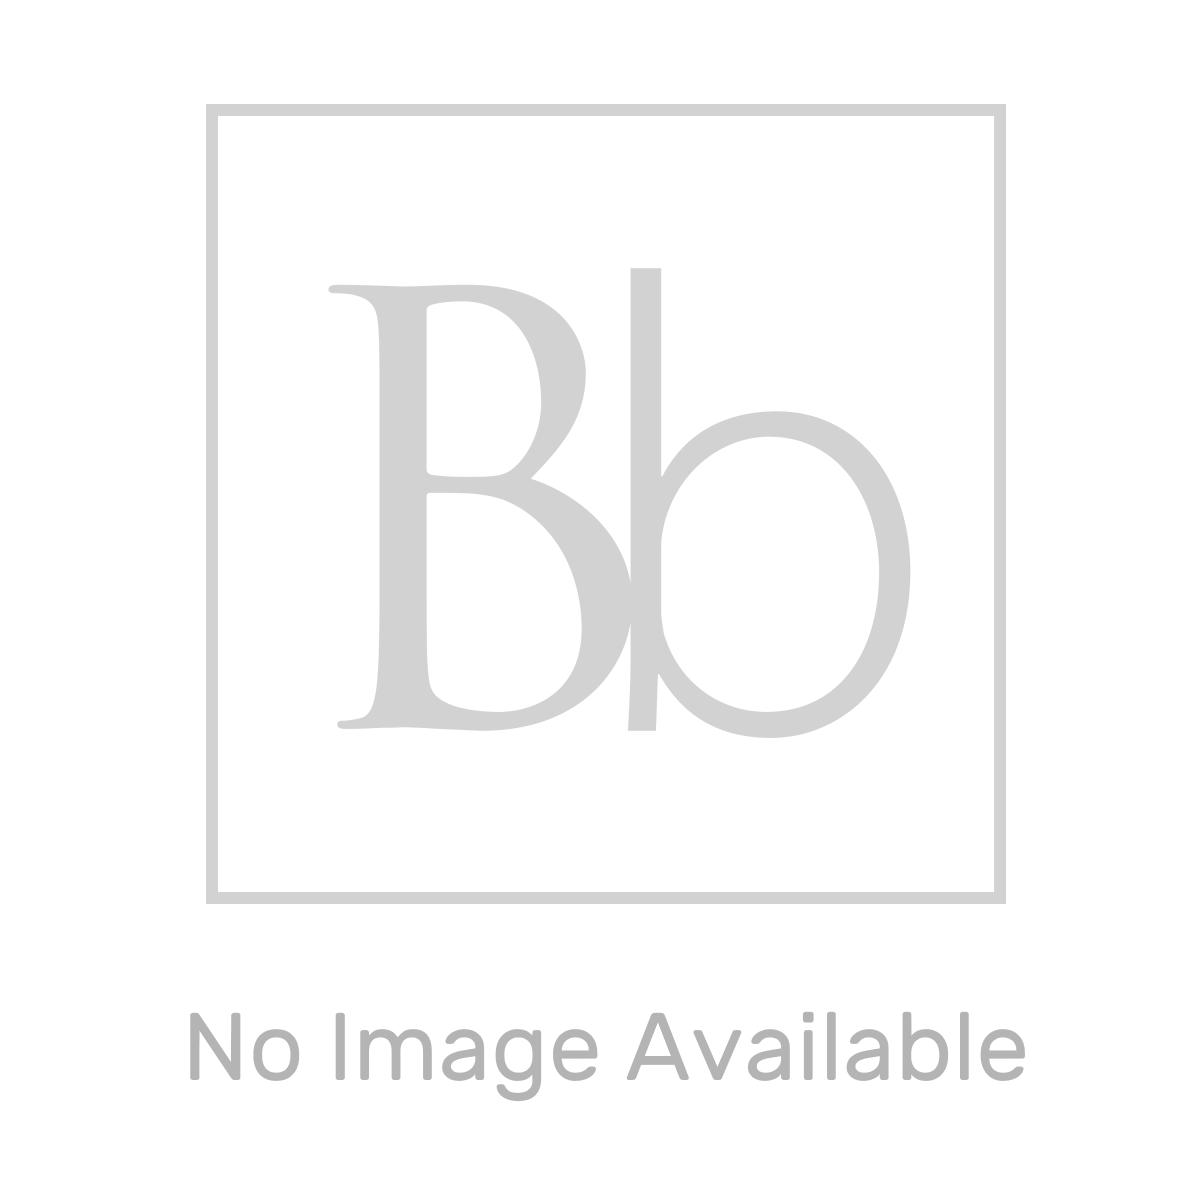 RAK Surface Charcoal Rustic Tile 300 x 600mm